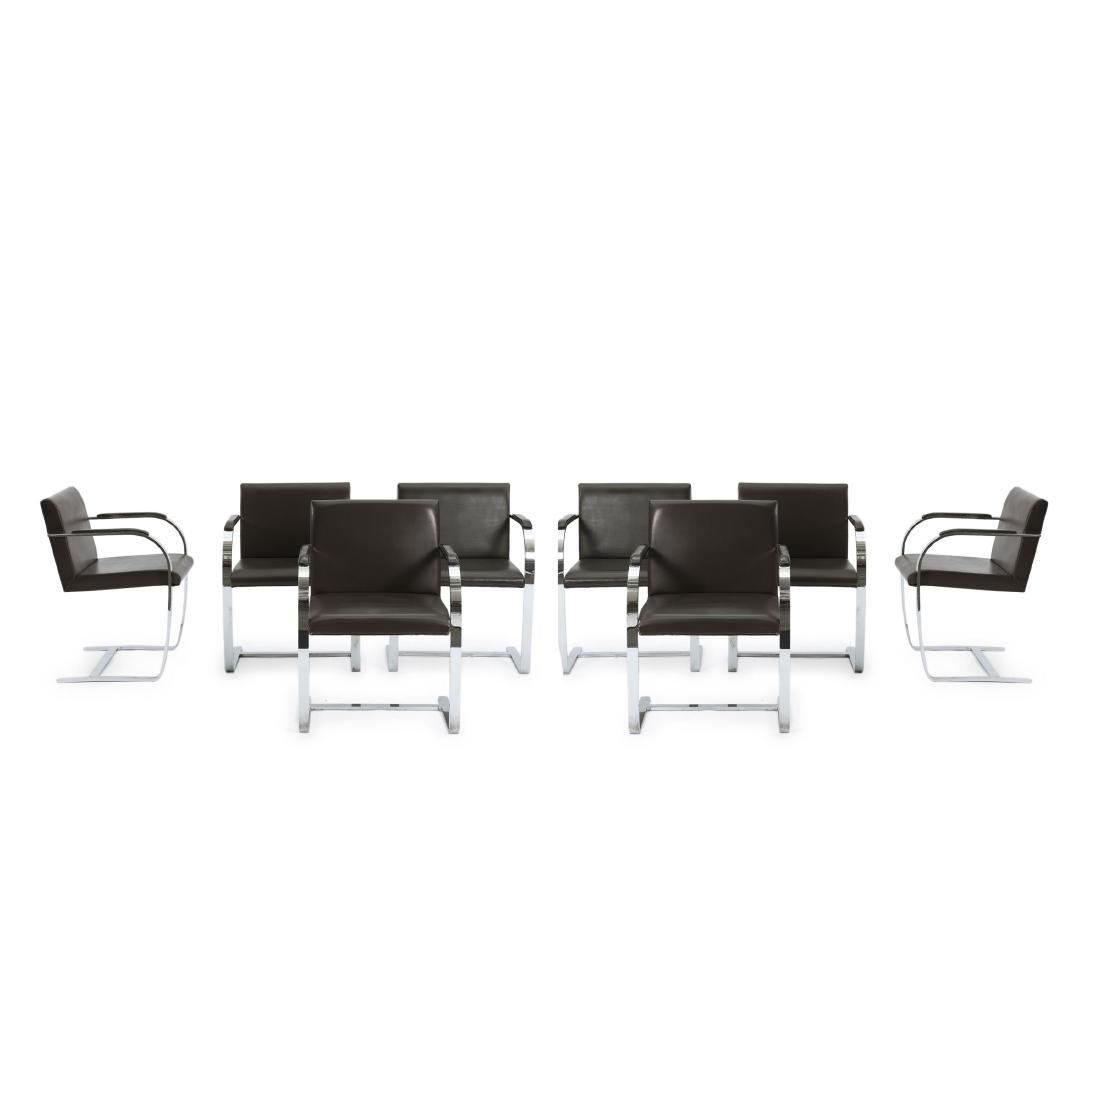 Eight 'Brno' armchairs, 1929/30